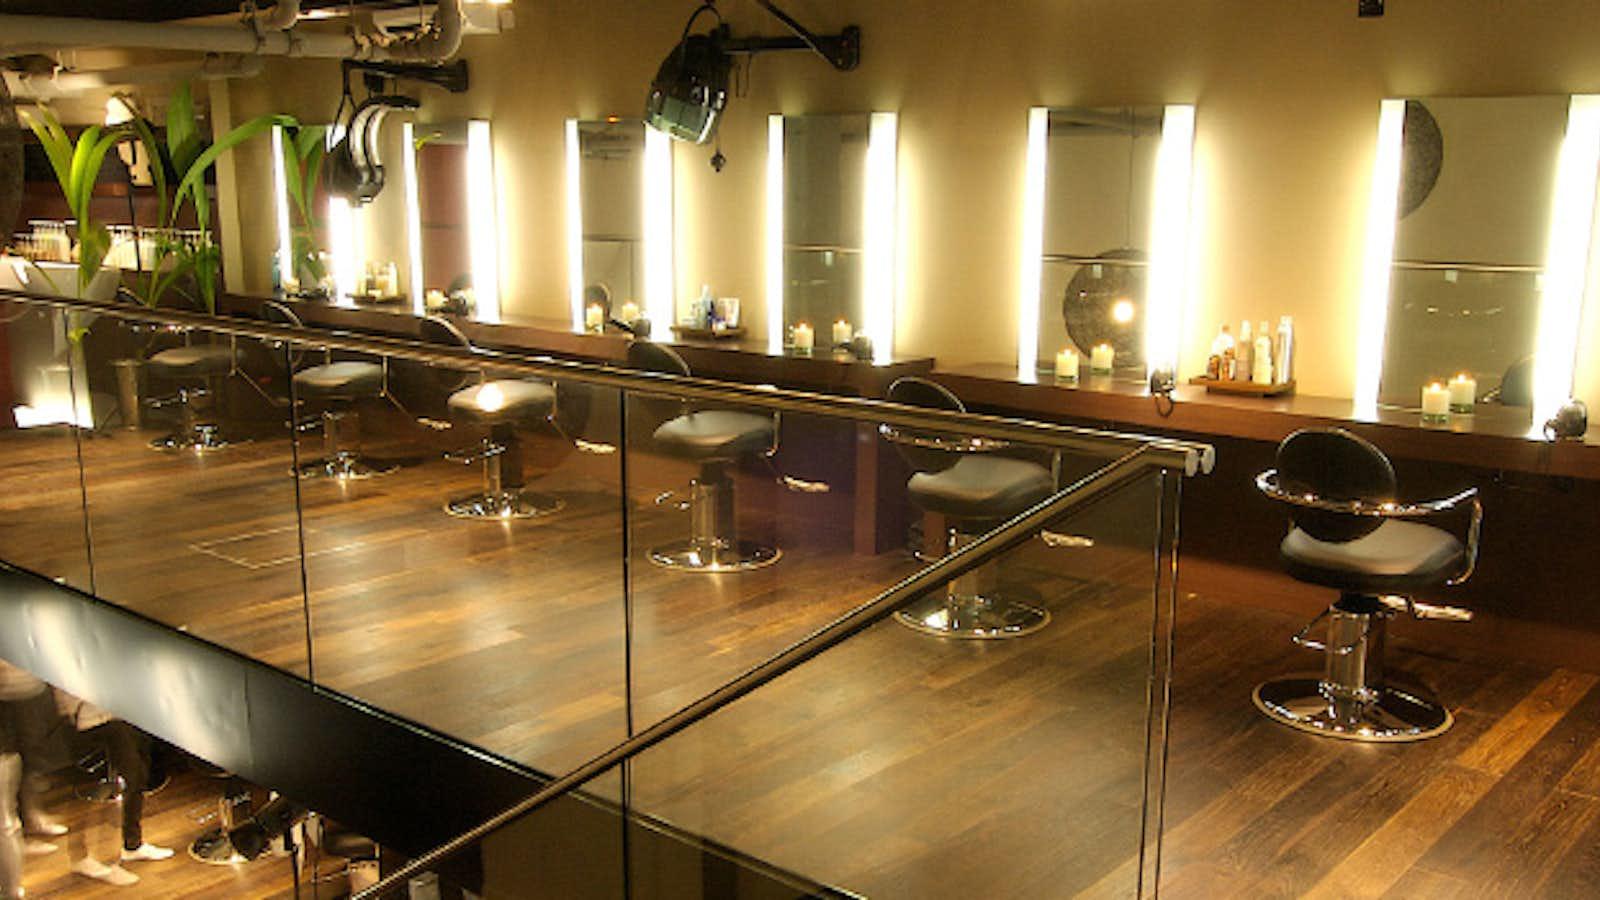 Bloom Aveda Lifestyle Salon (formerly James Dun's House)